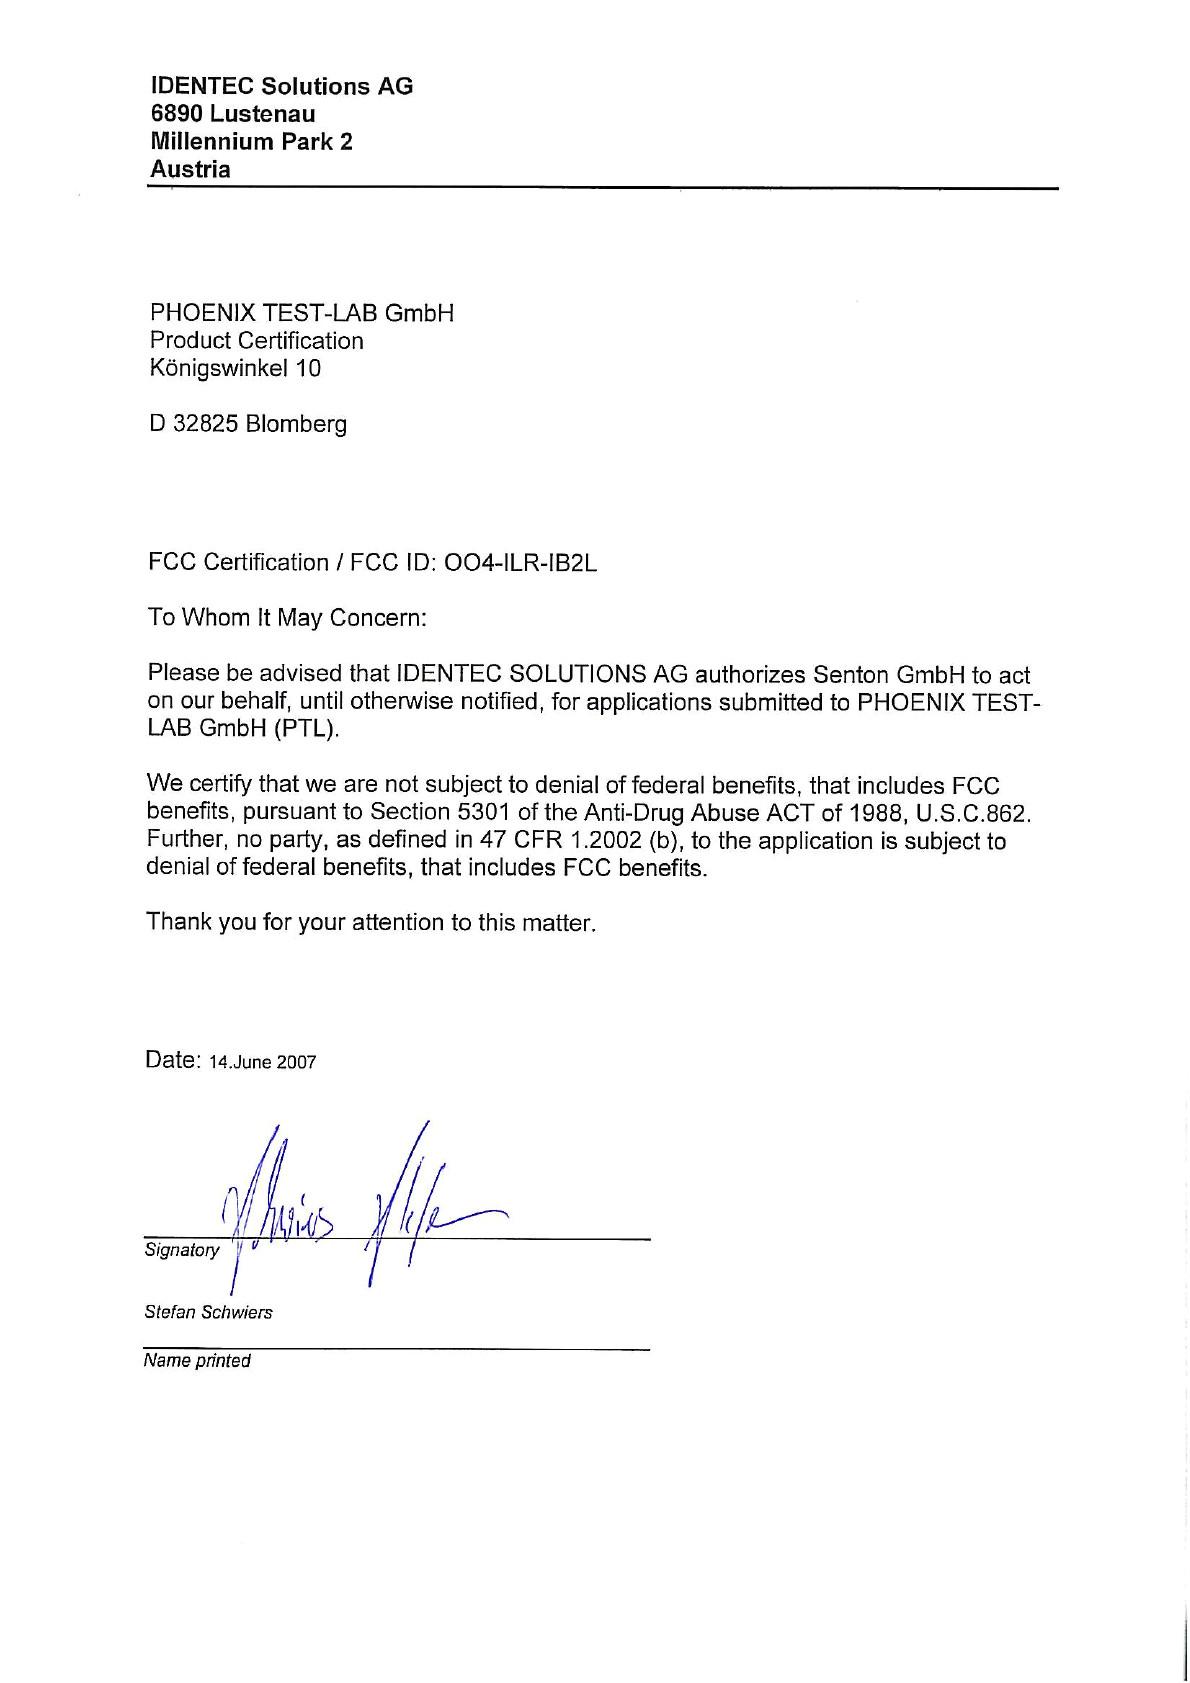 aurhorization letter 812029